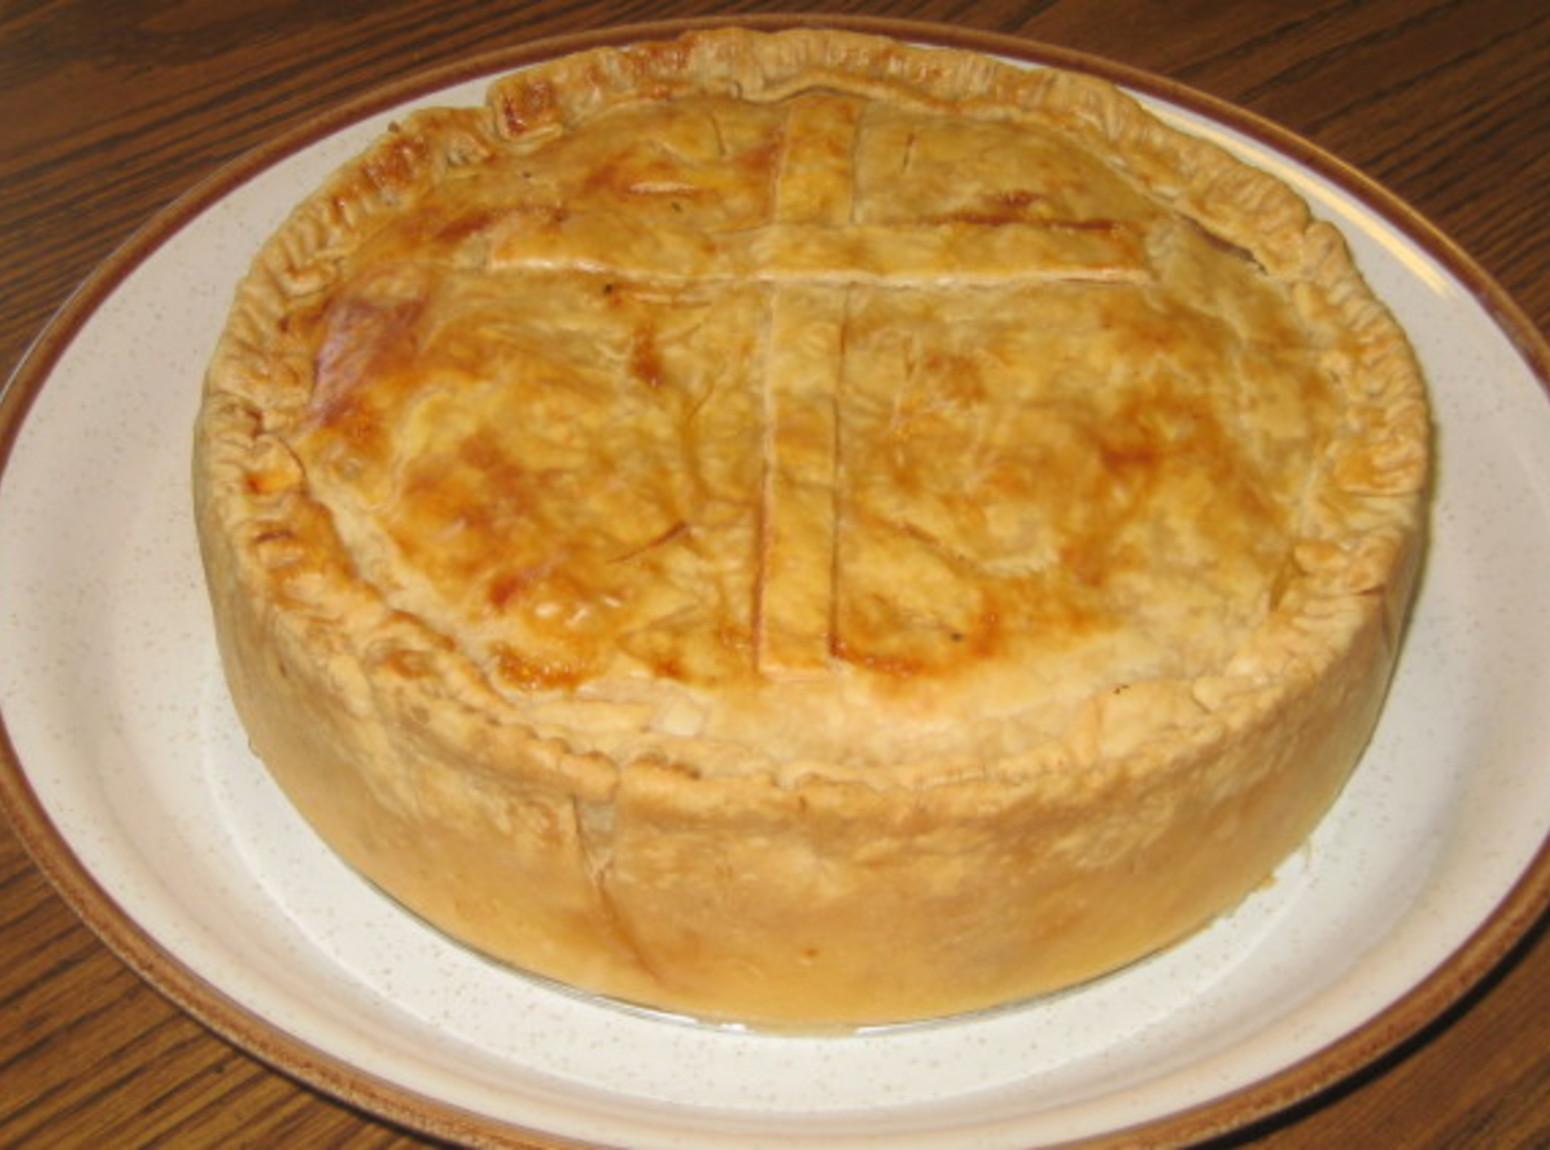 Italian Easter Pie Recipes  Italian Easter Pie Pizza Chena Recipe